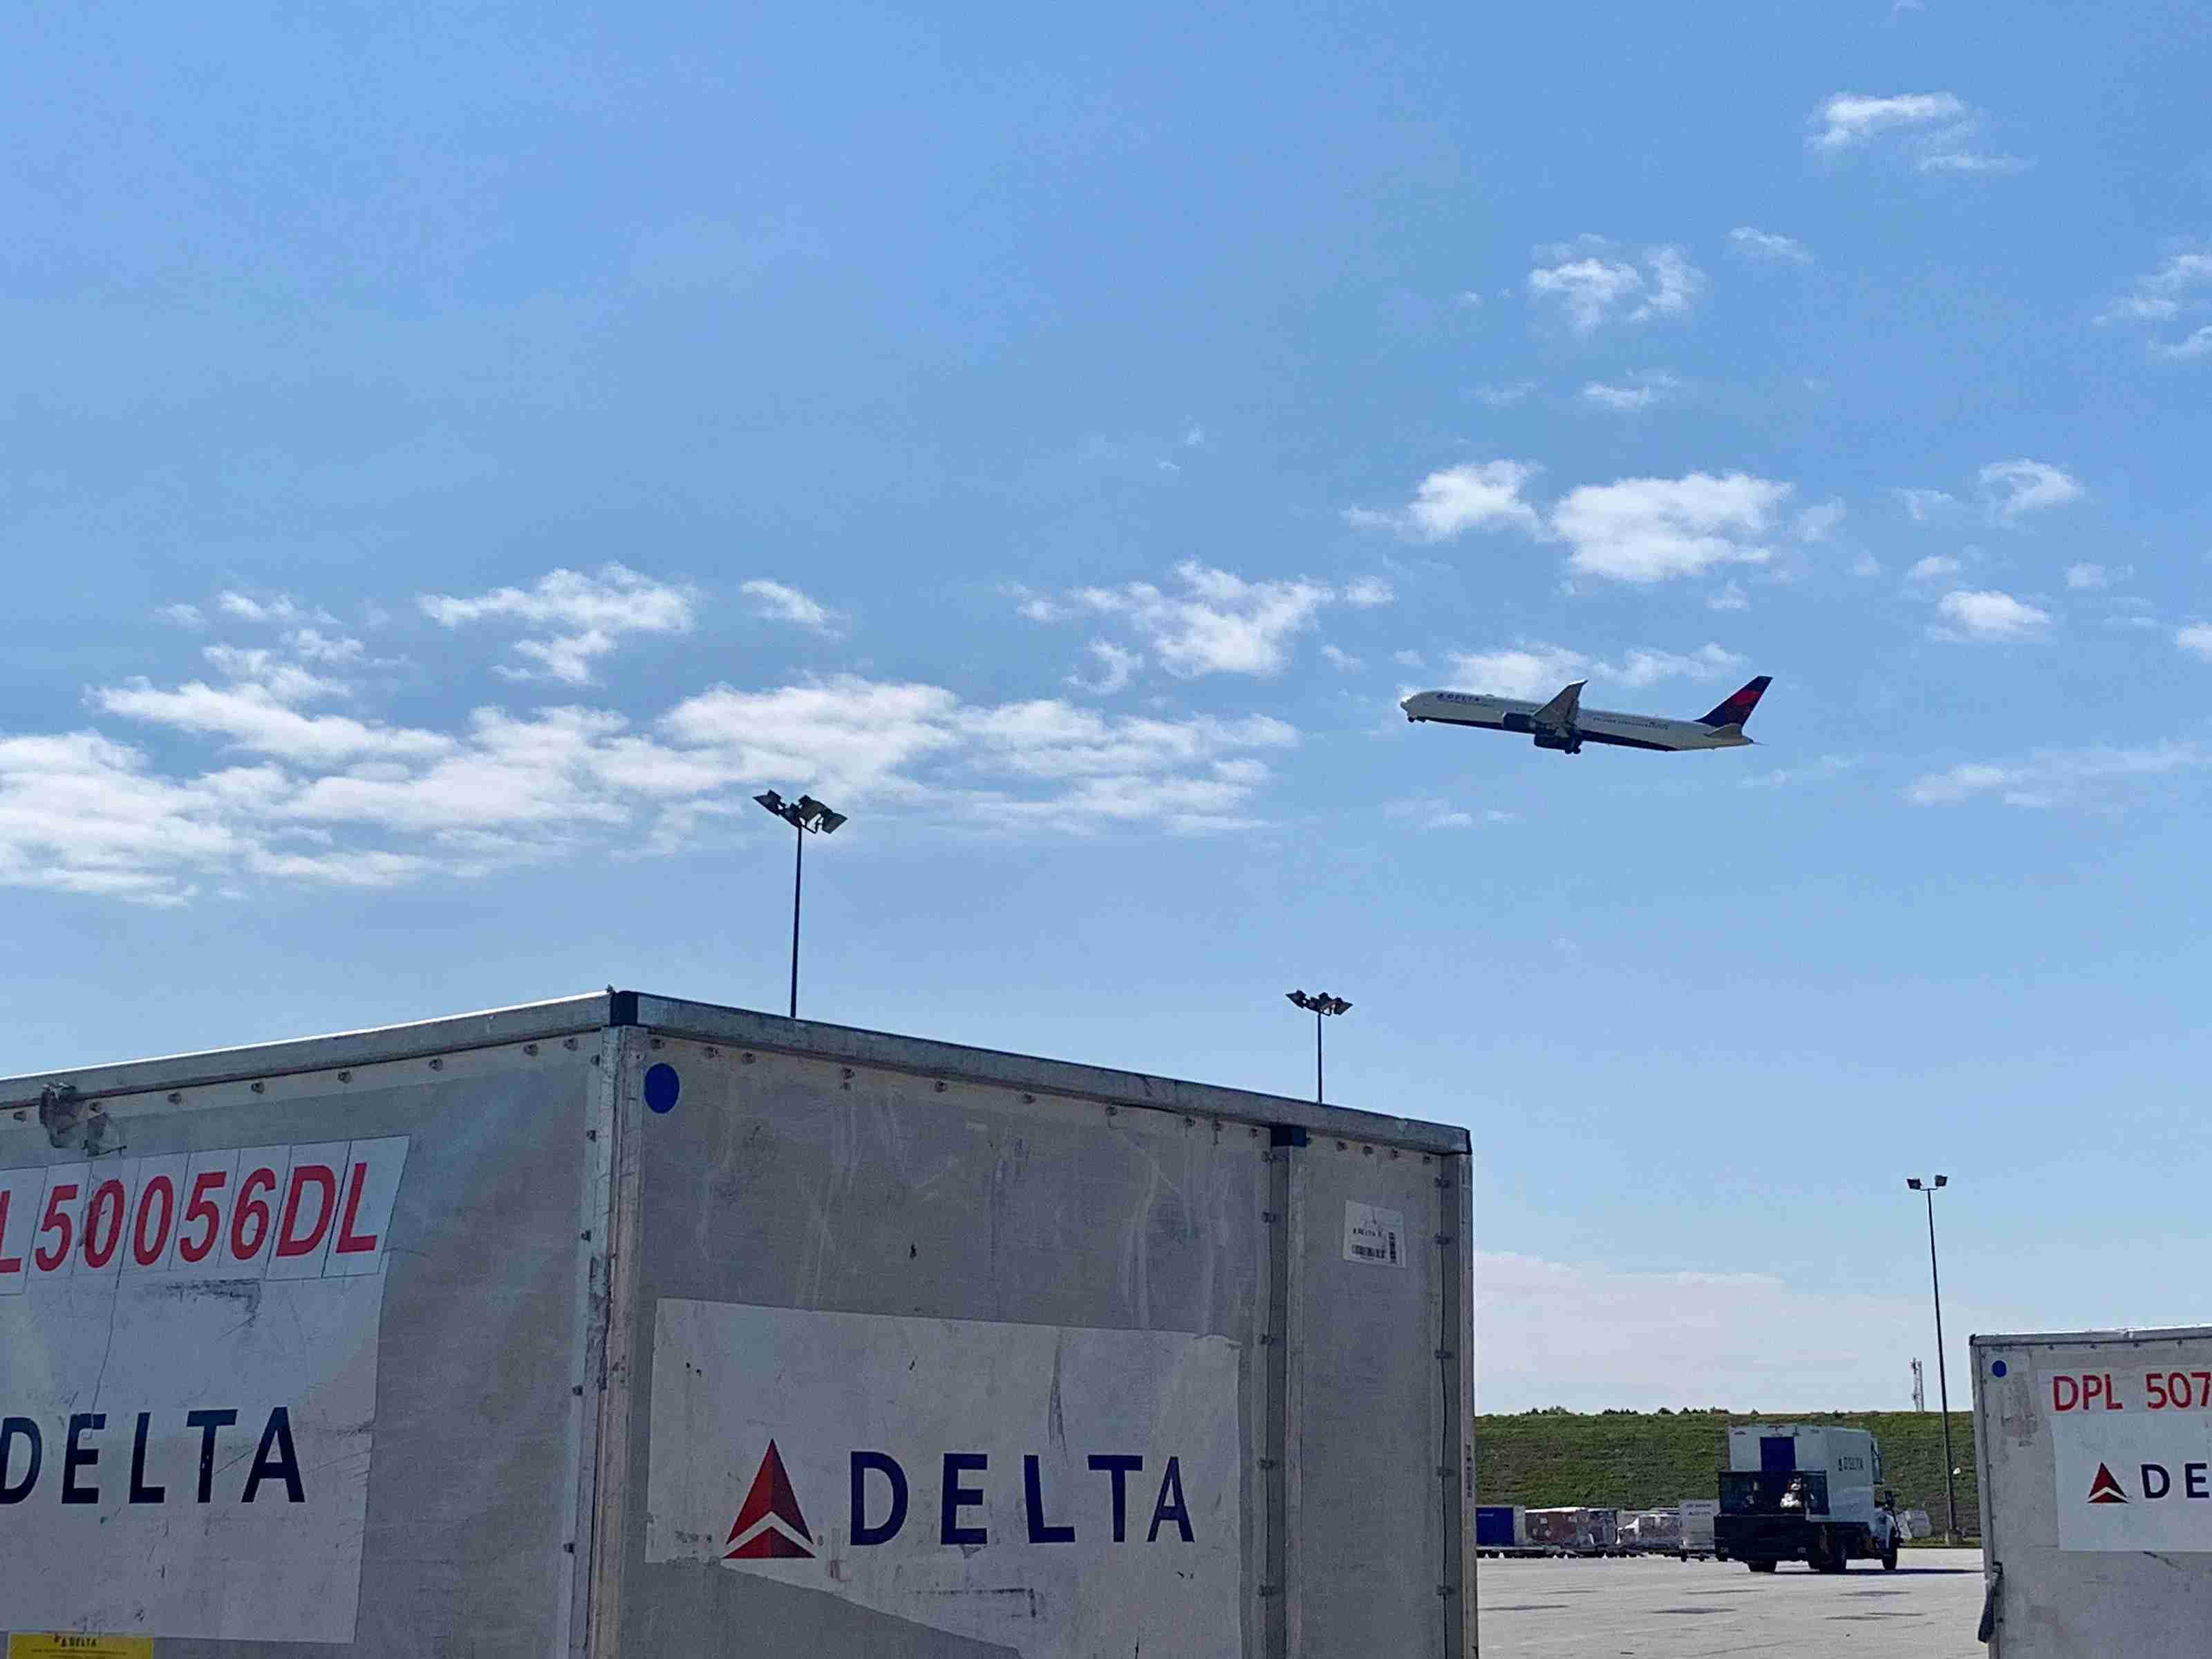 delta-atlanta-atl-cargo-plane-liftoff